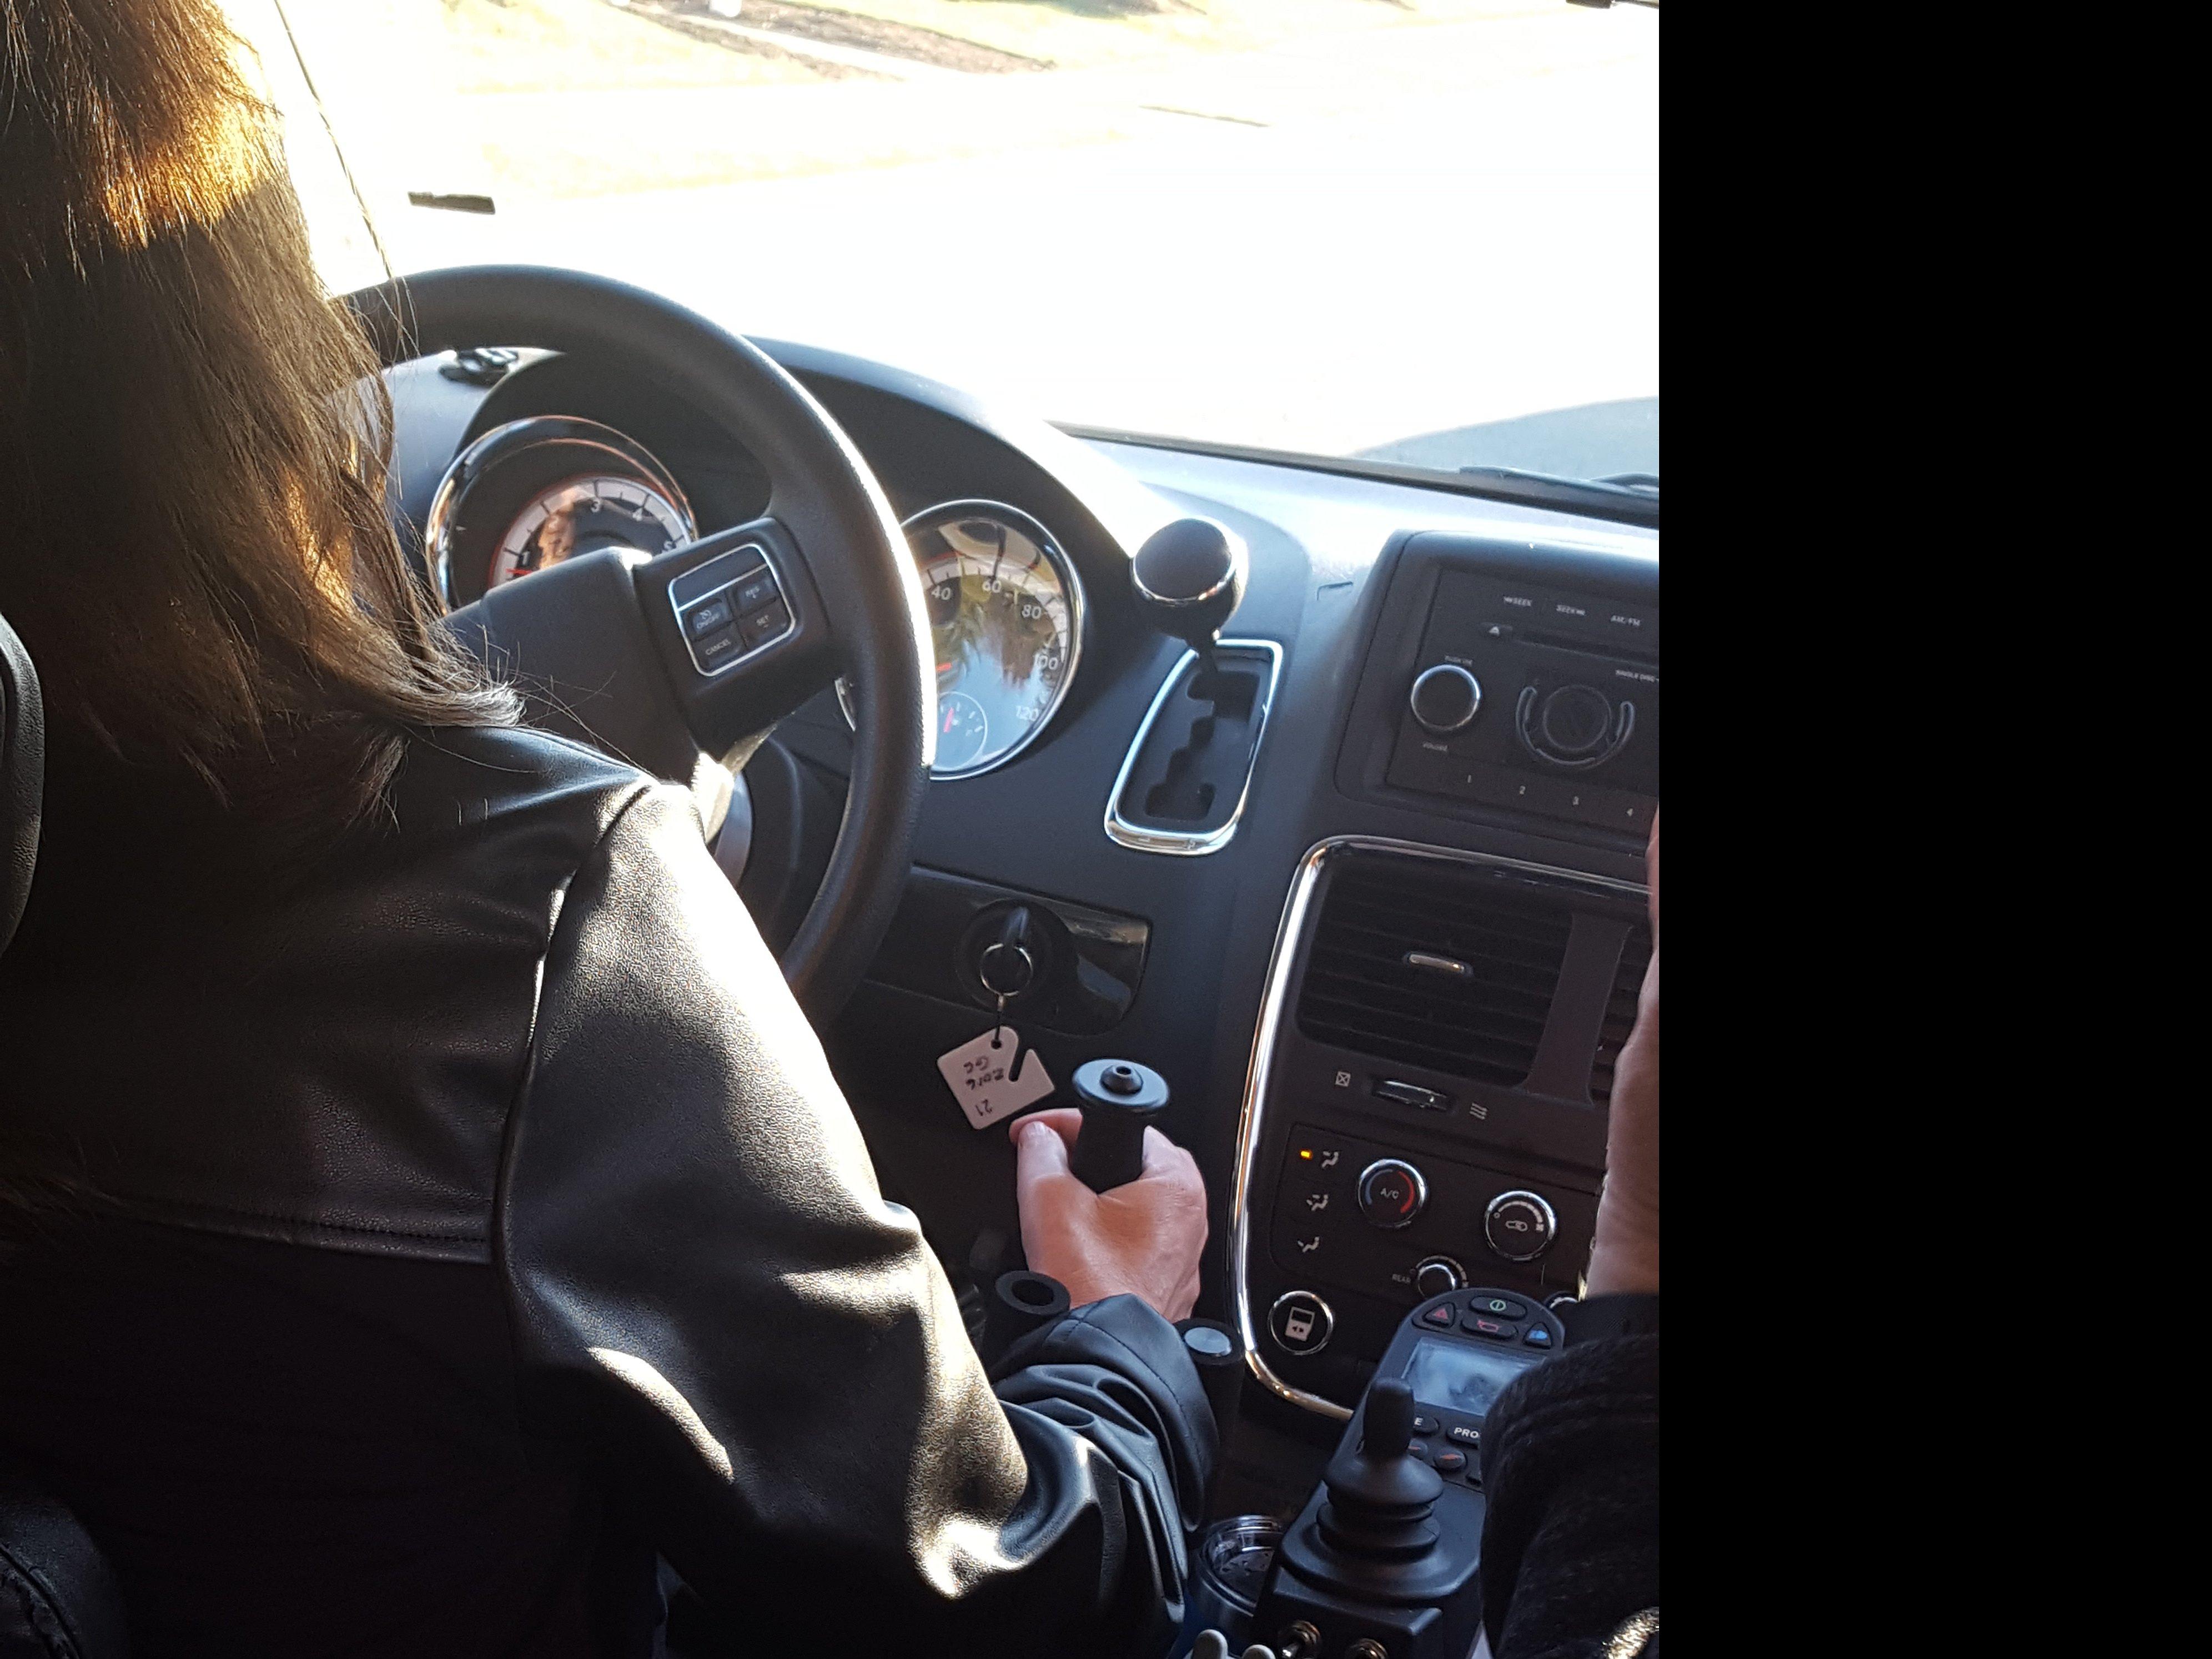 Driving!